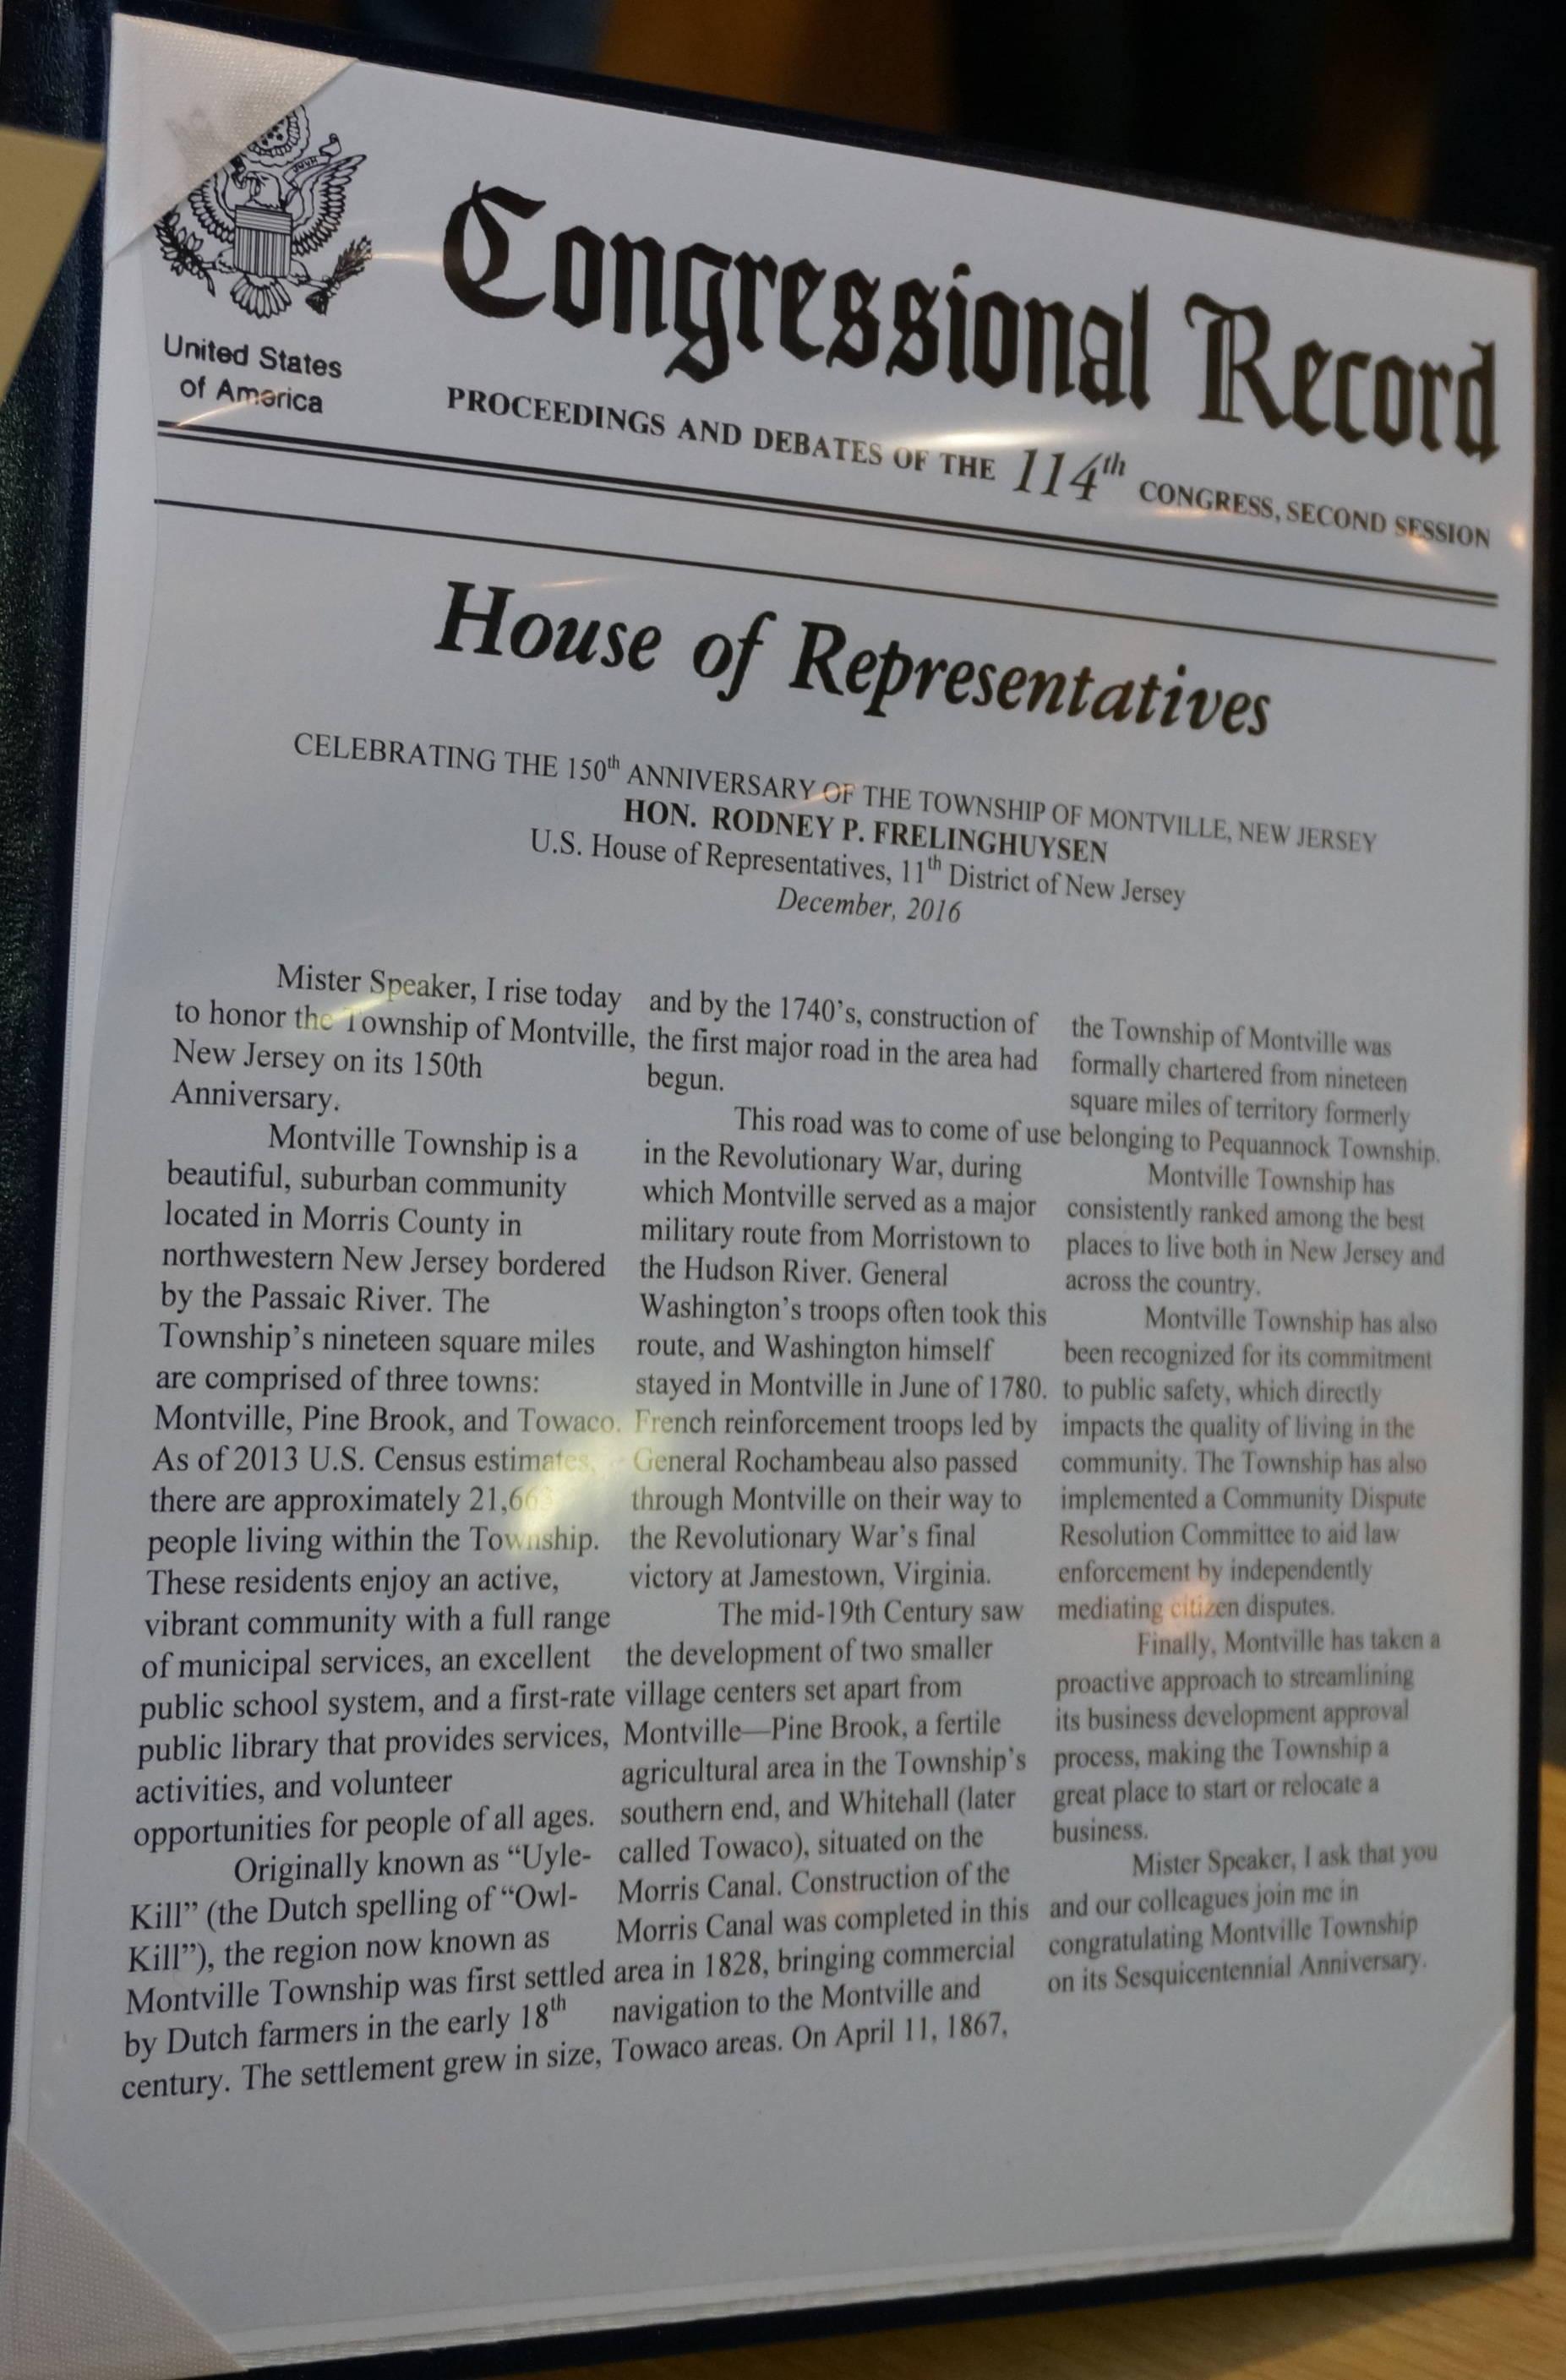 123ad08819a9cc91c610_1_Congressional_Record.JPG